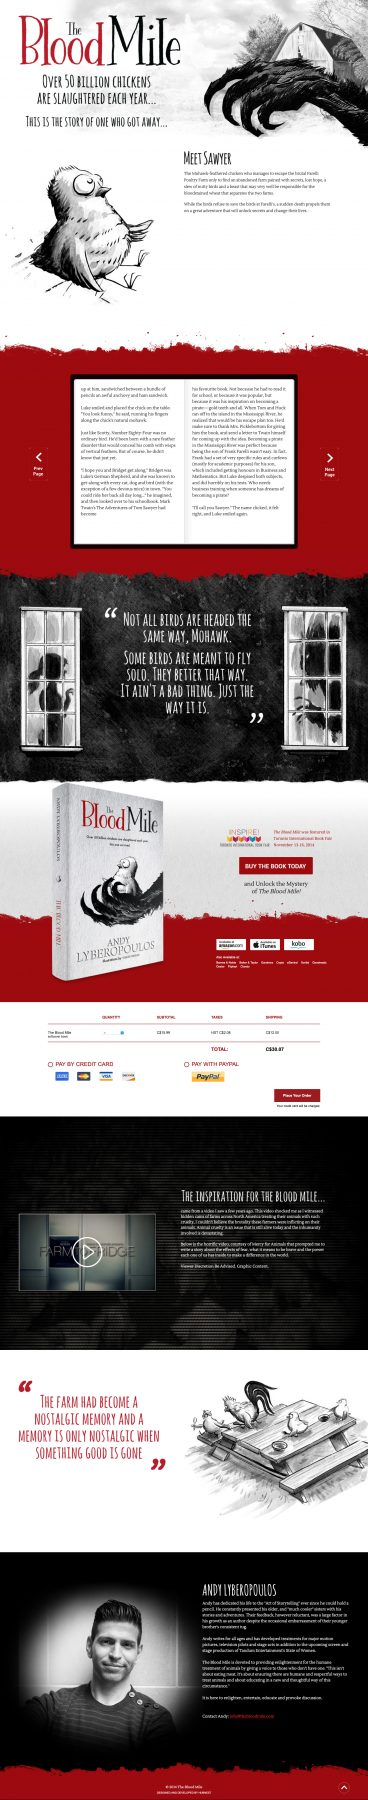 thebloodmile.com screendump